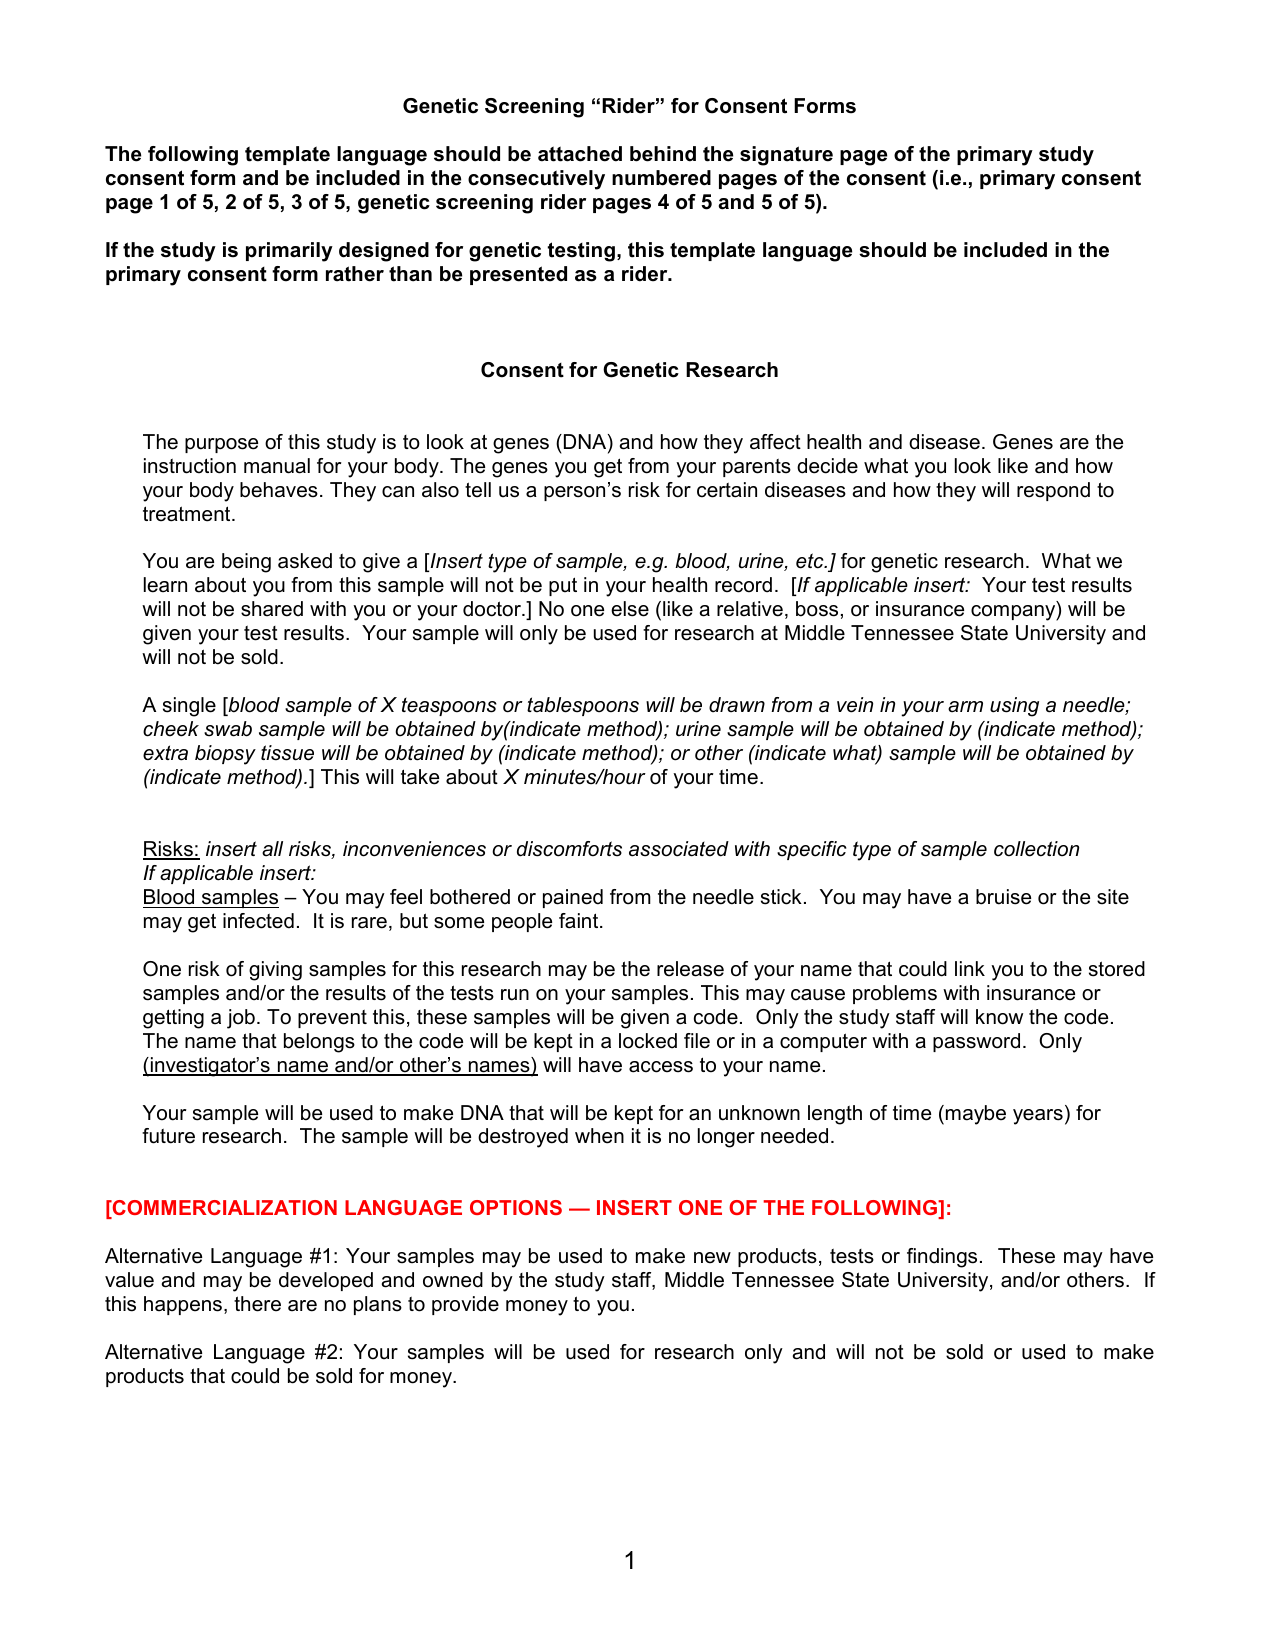 Genetic screening rider for consent forms altavistaventures Gallery